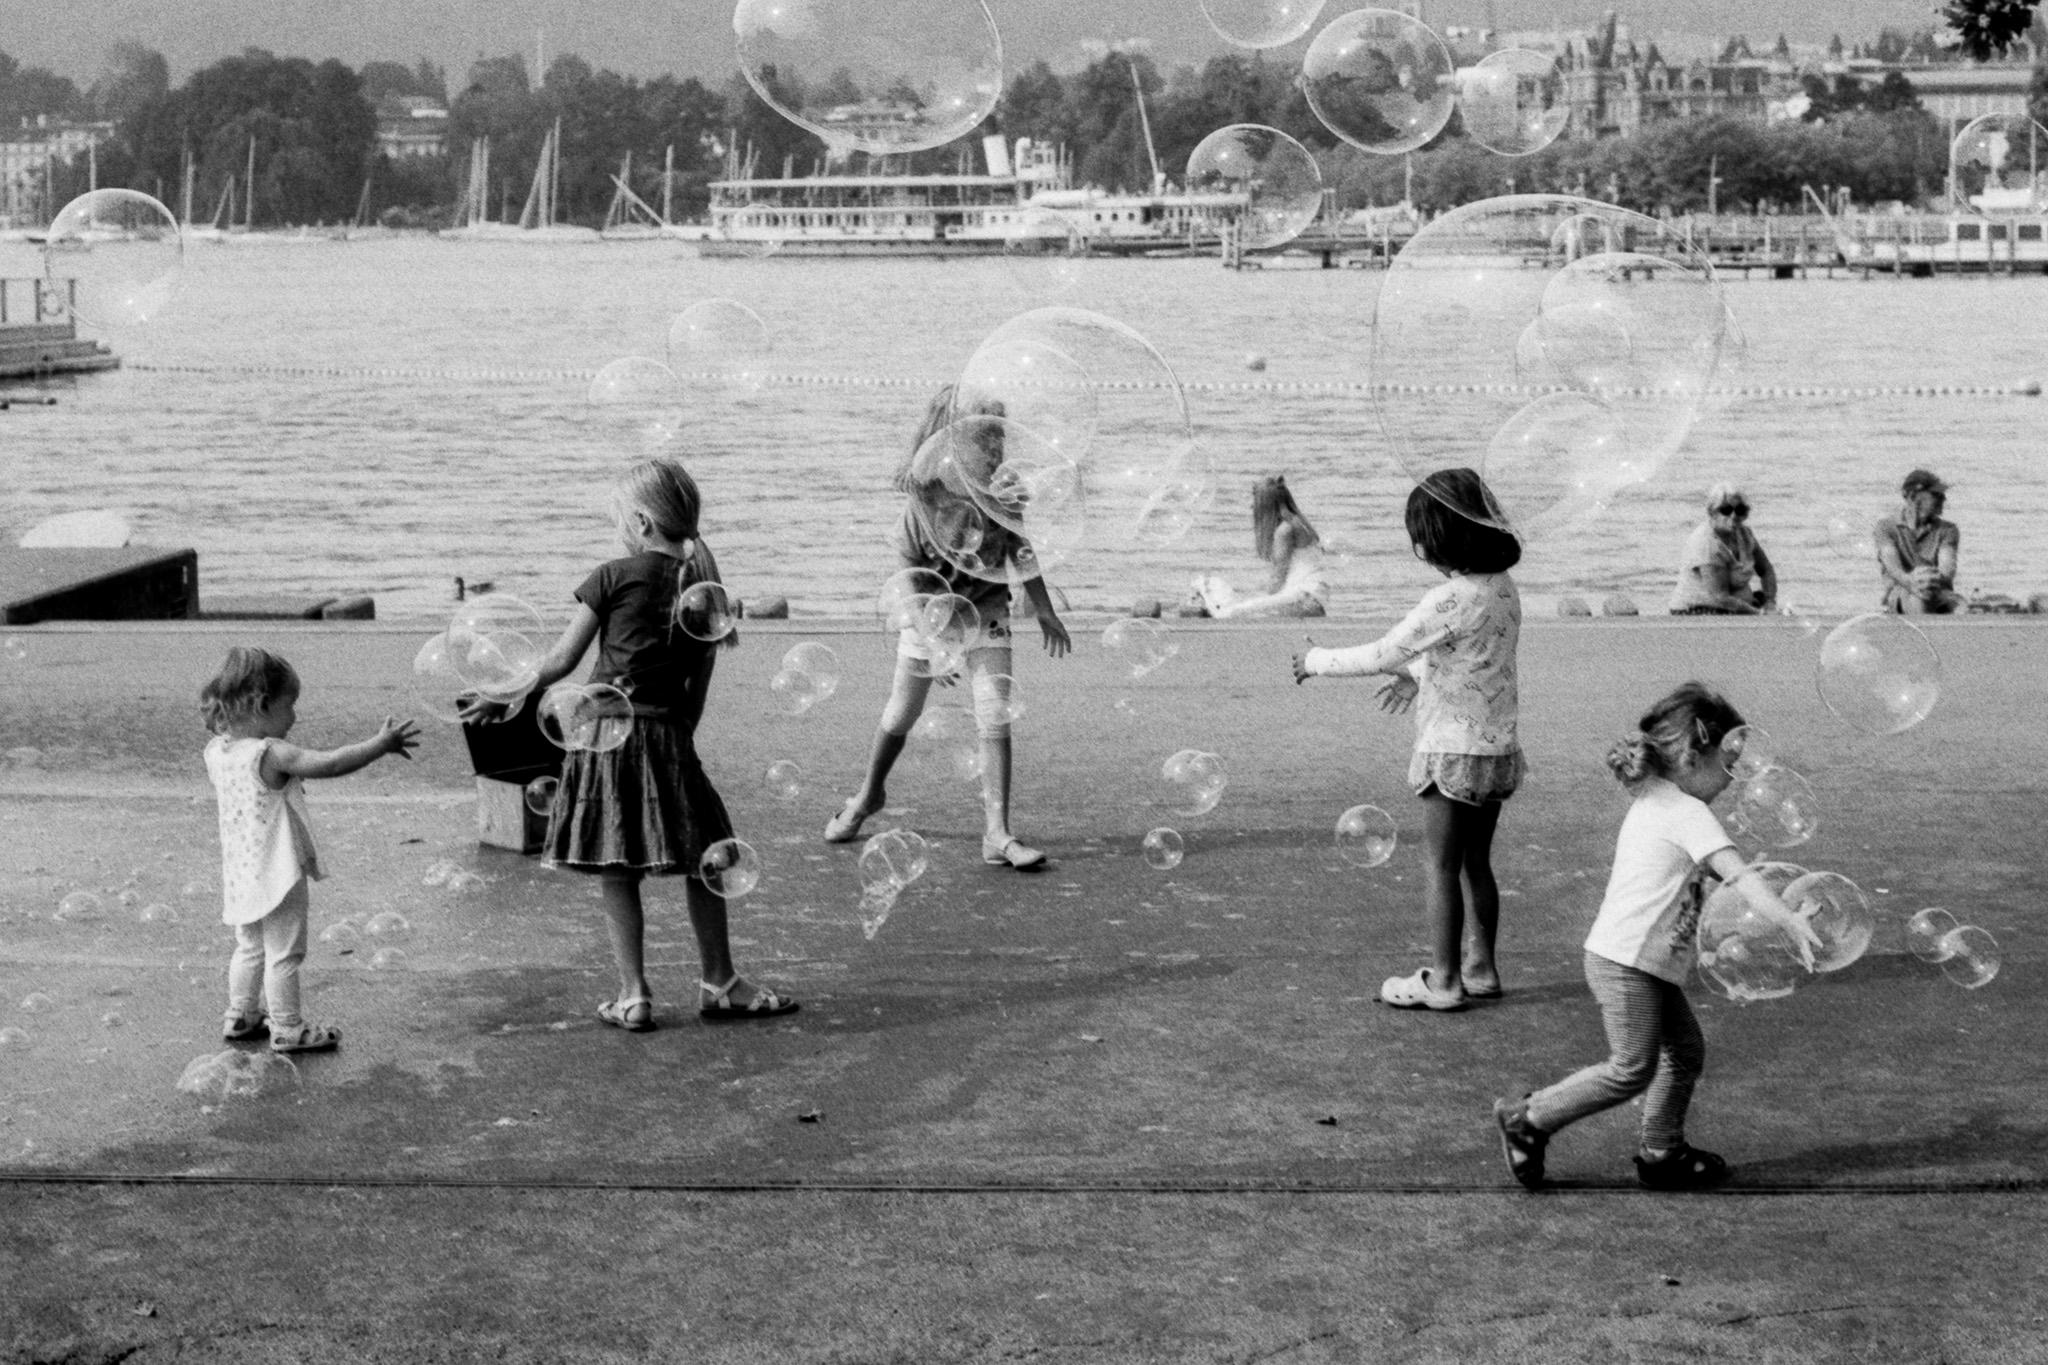 Daniel Stoessel | Kids and Bubbles | Canon AV-1 | Fomapan 100